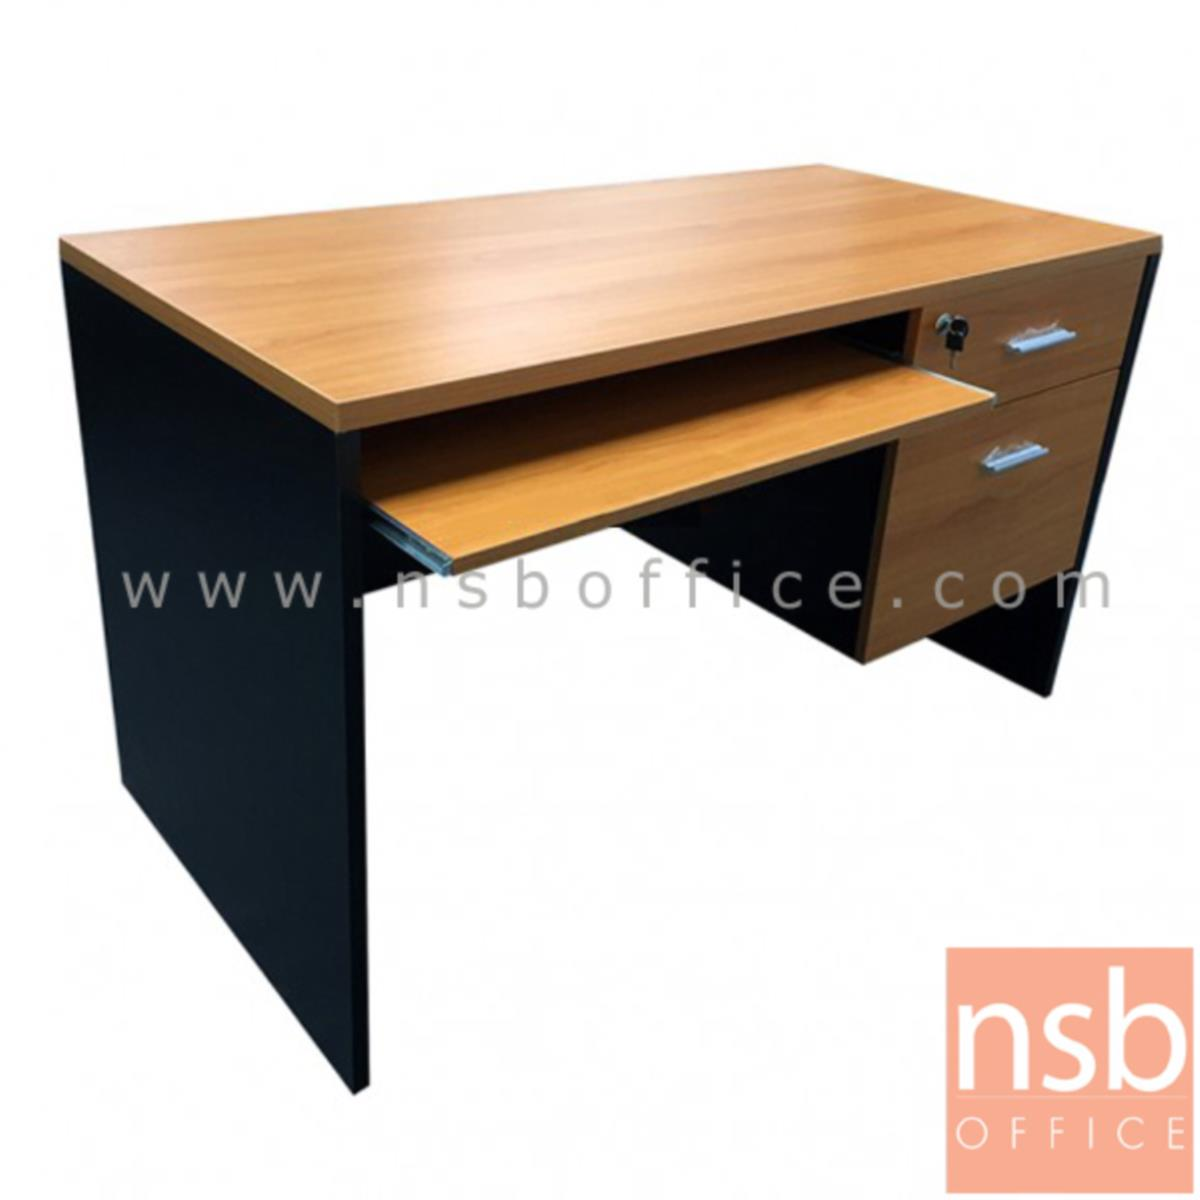 A12A011:โต๊ะคอมพิวเตอร์ 2 ลิ้นชัก  รุ่น Thicke (ธิก) ขนาด 120W ,135W ,150W*60D ,75D cm.  พร้อมรางคีย์บอร์ด เมลามีน